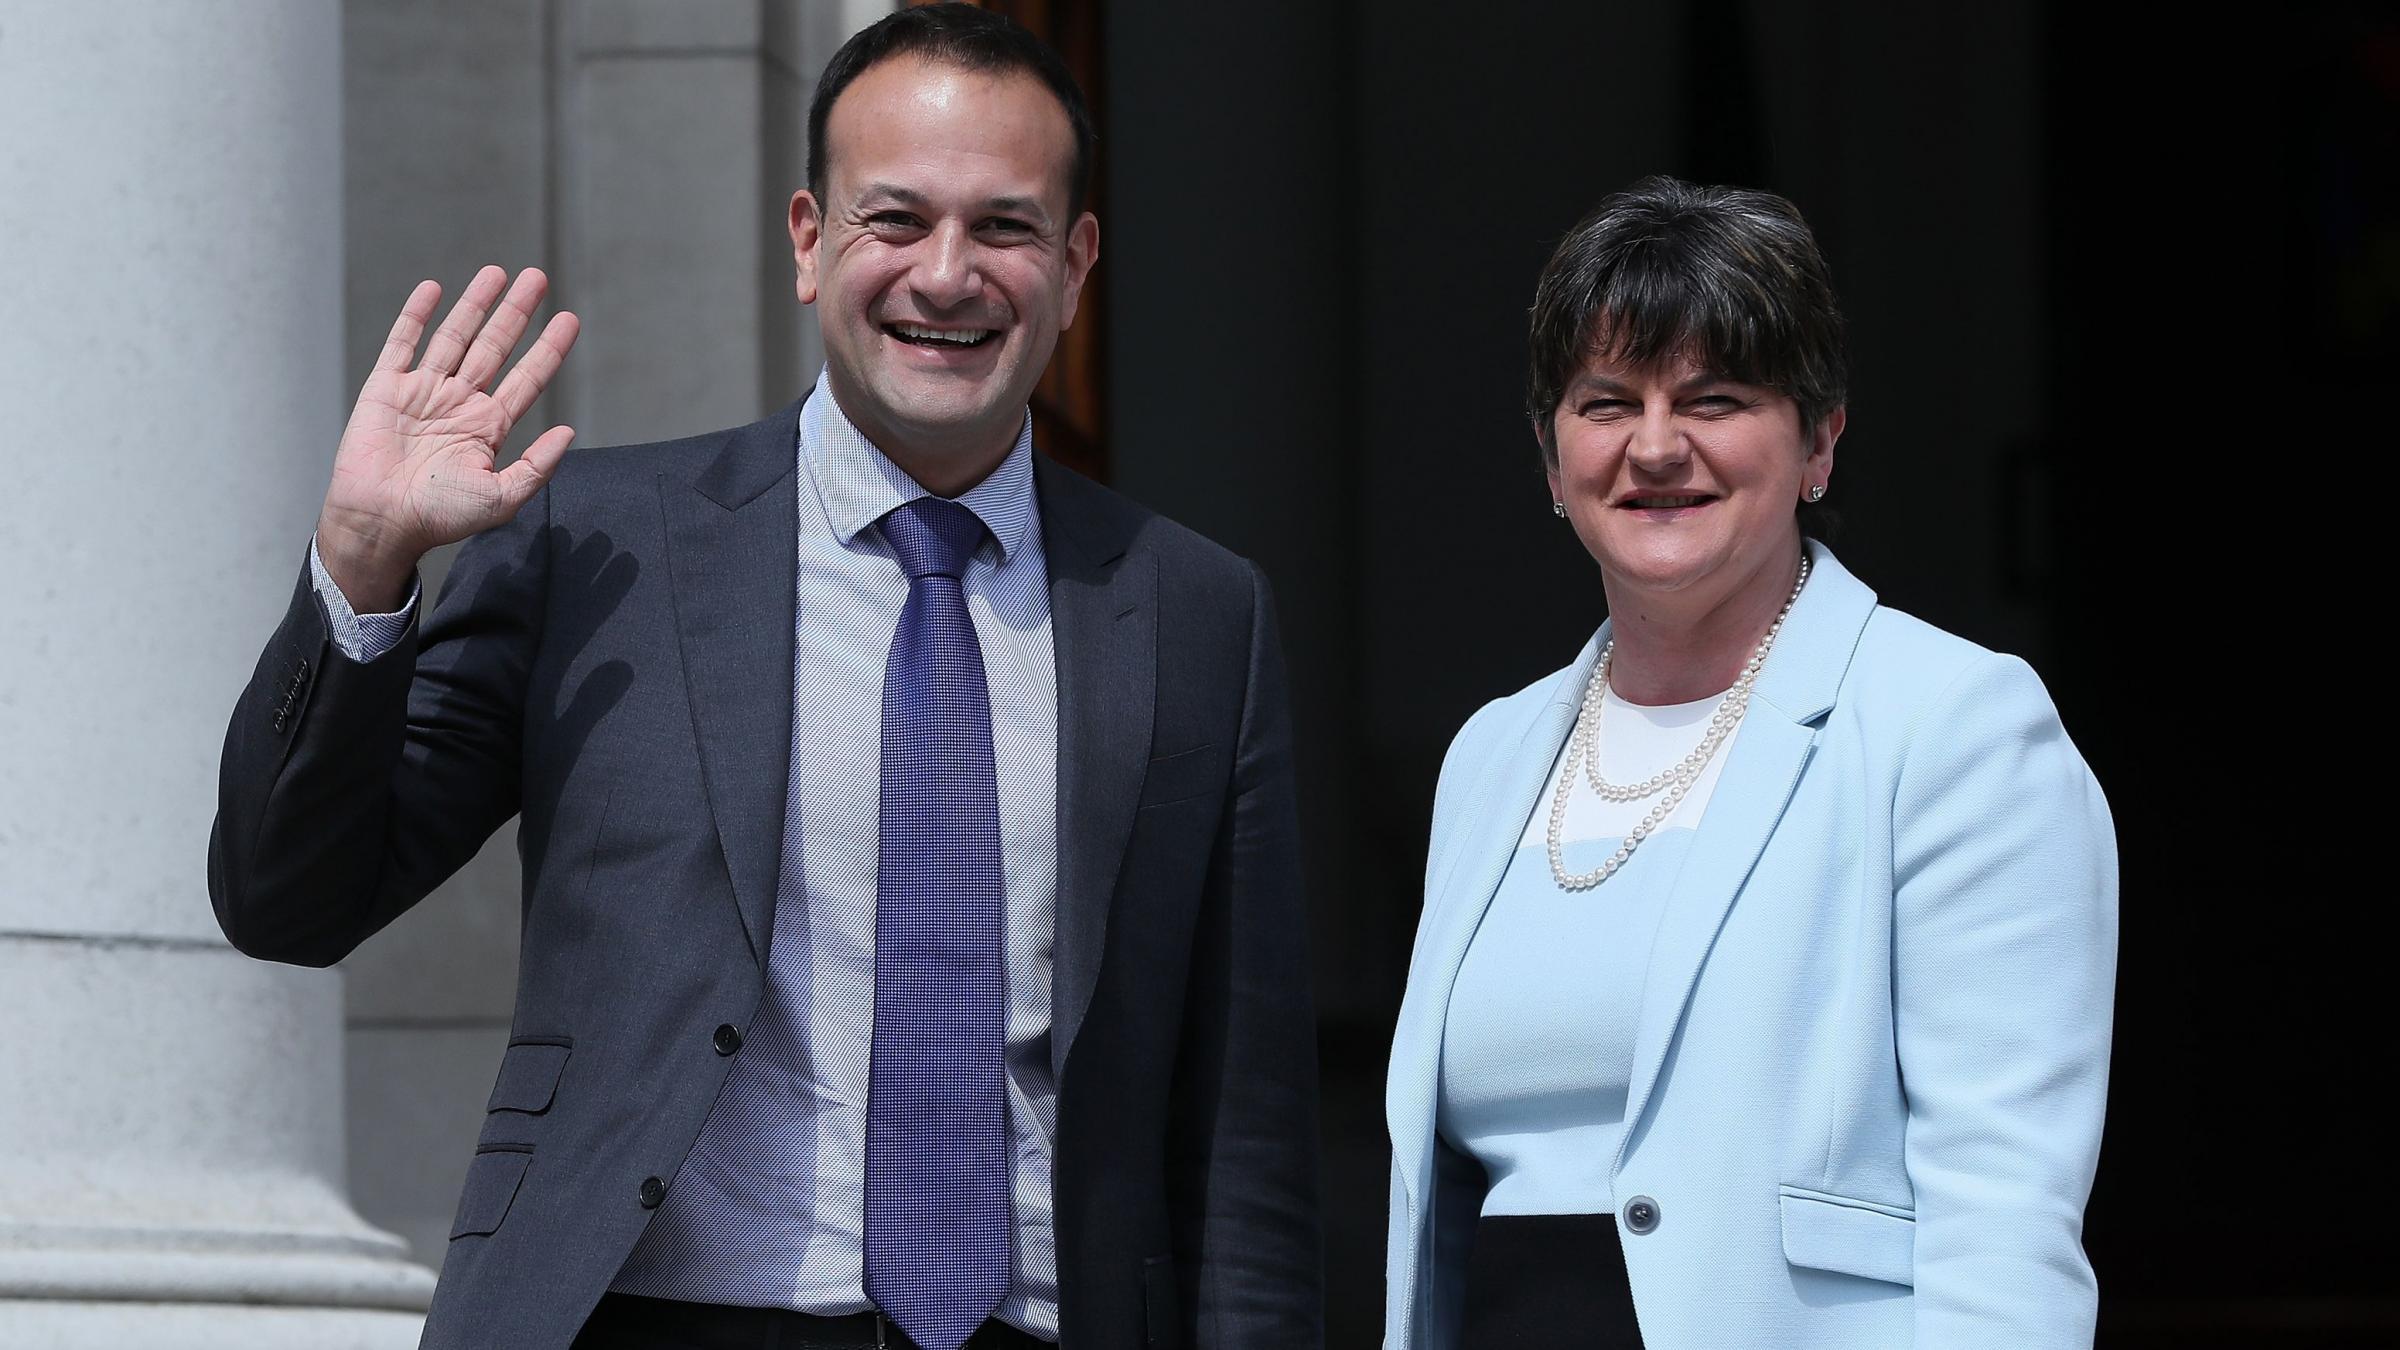 Irish, British PMs to meet to talk Brexit, Northen Ireland crisis